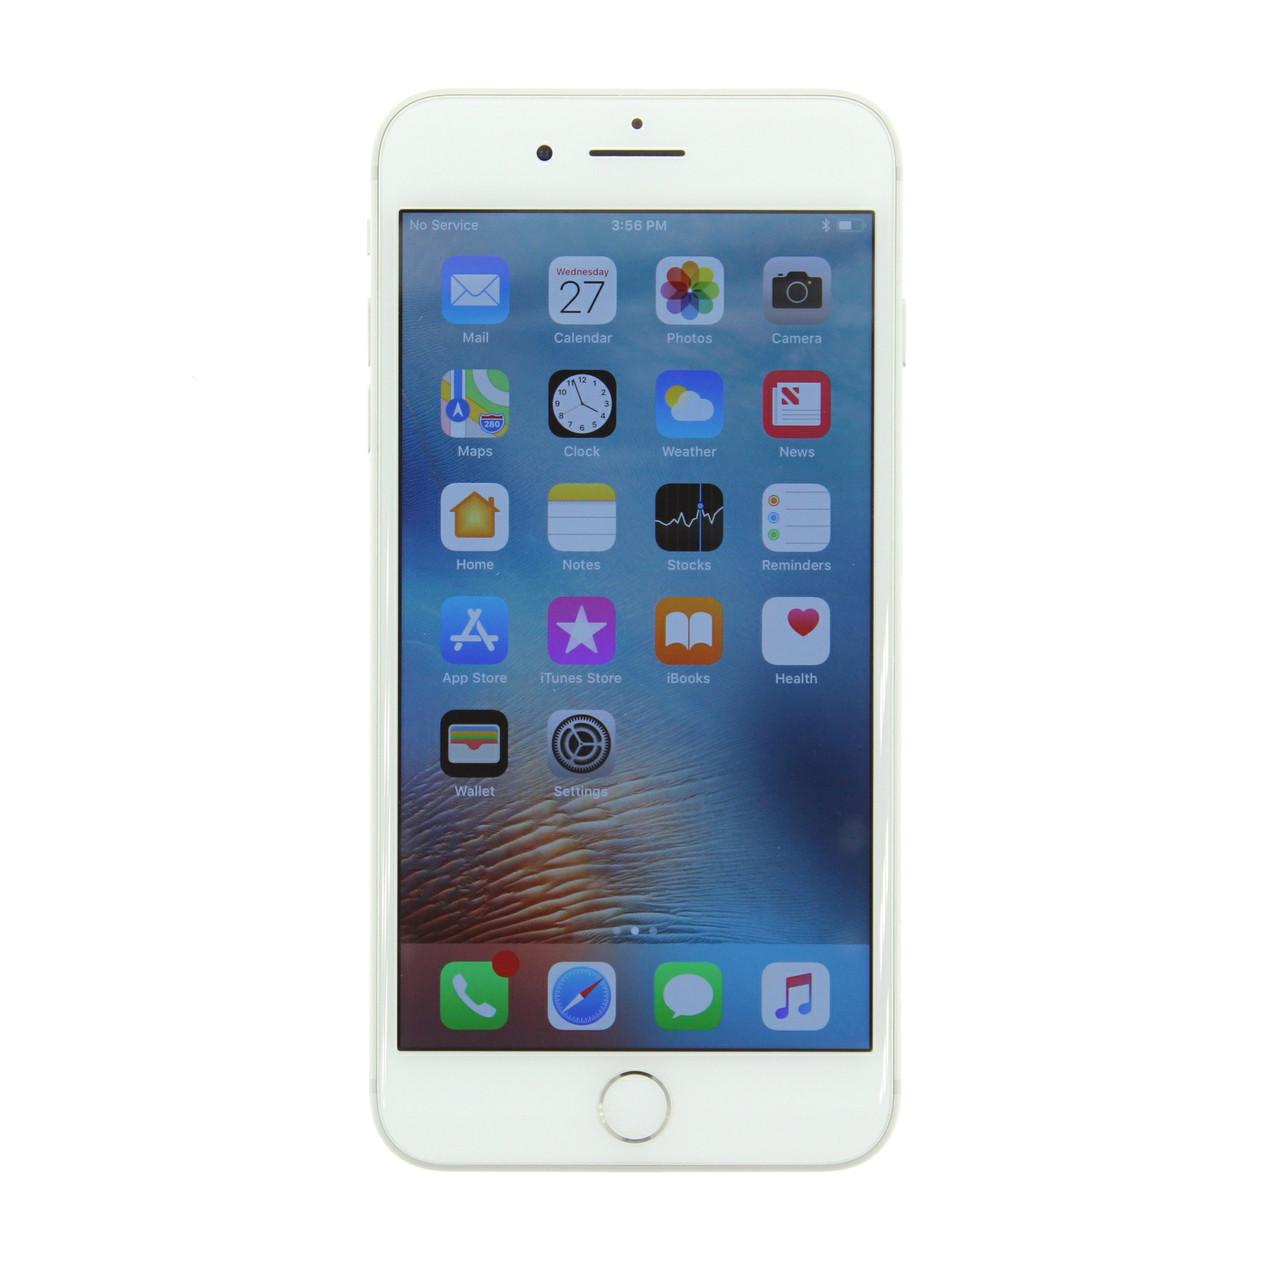 Apple iPhone 8 Plus a1864 64GB Verizon Unlocked - Very Good